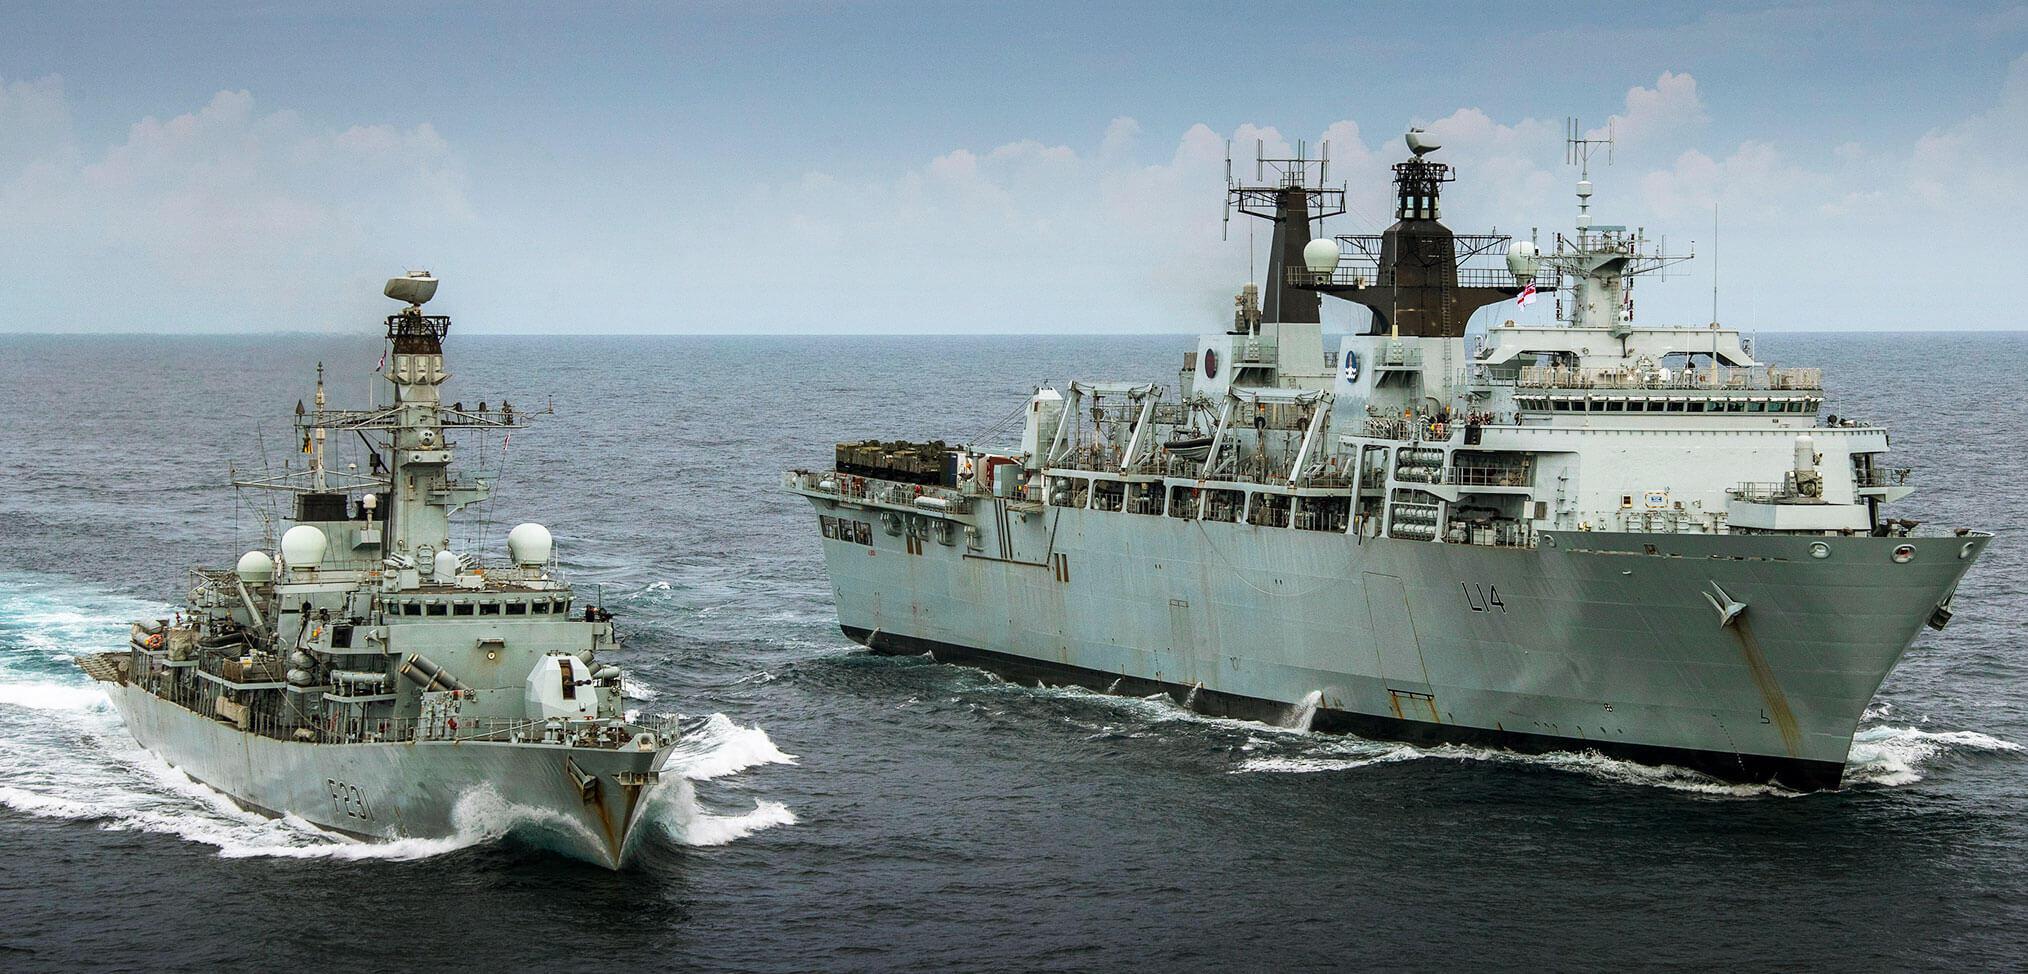 HMS Albion and HMS Argyll